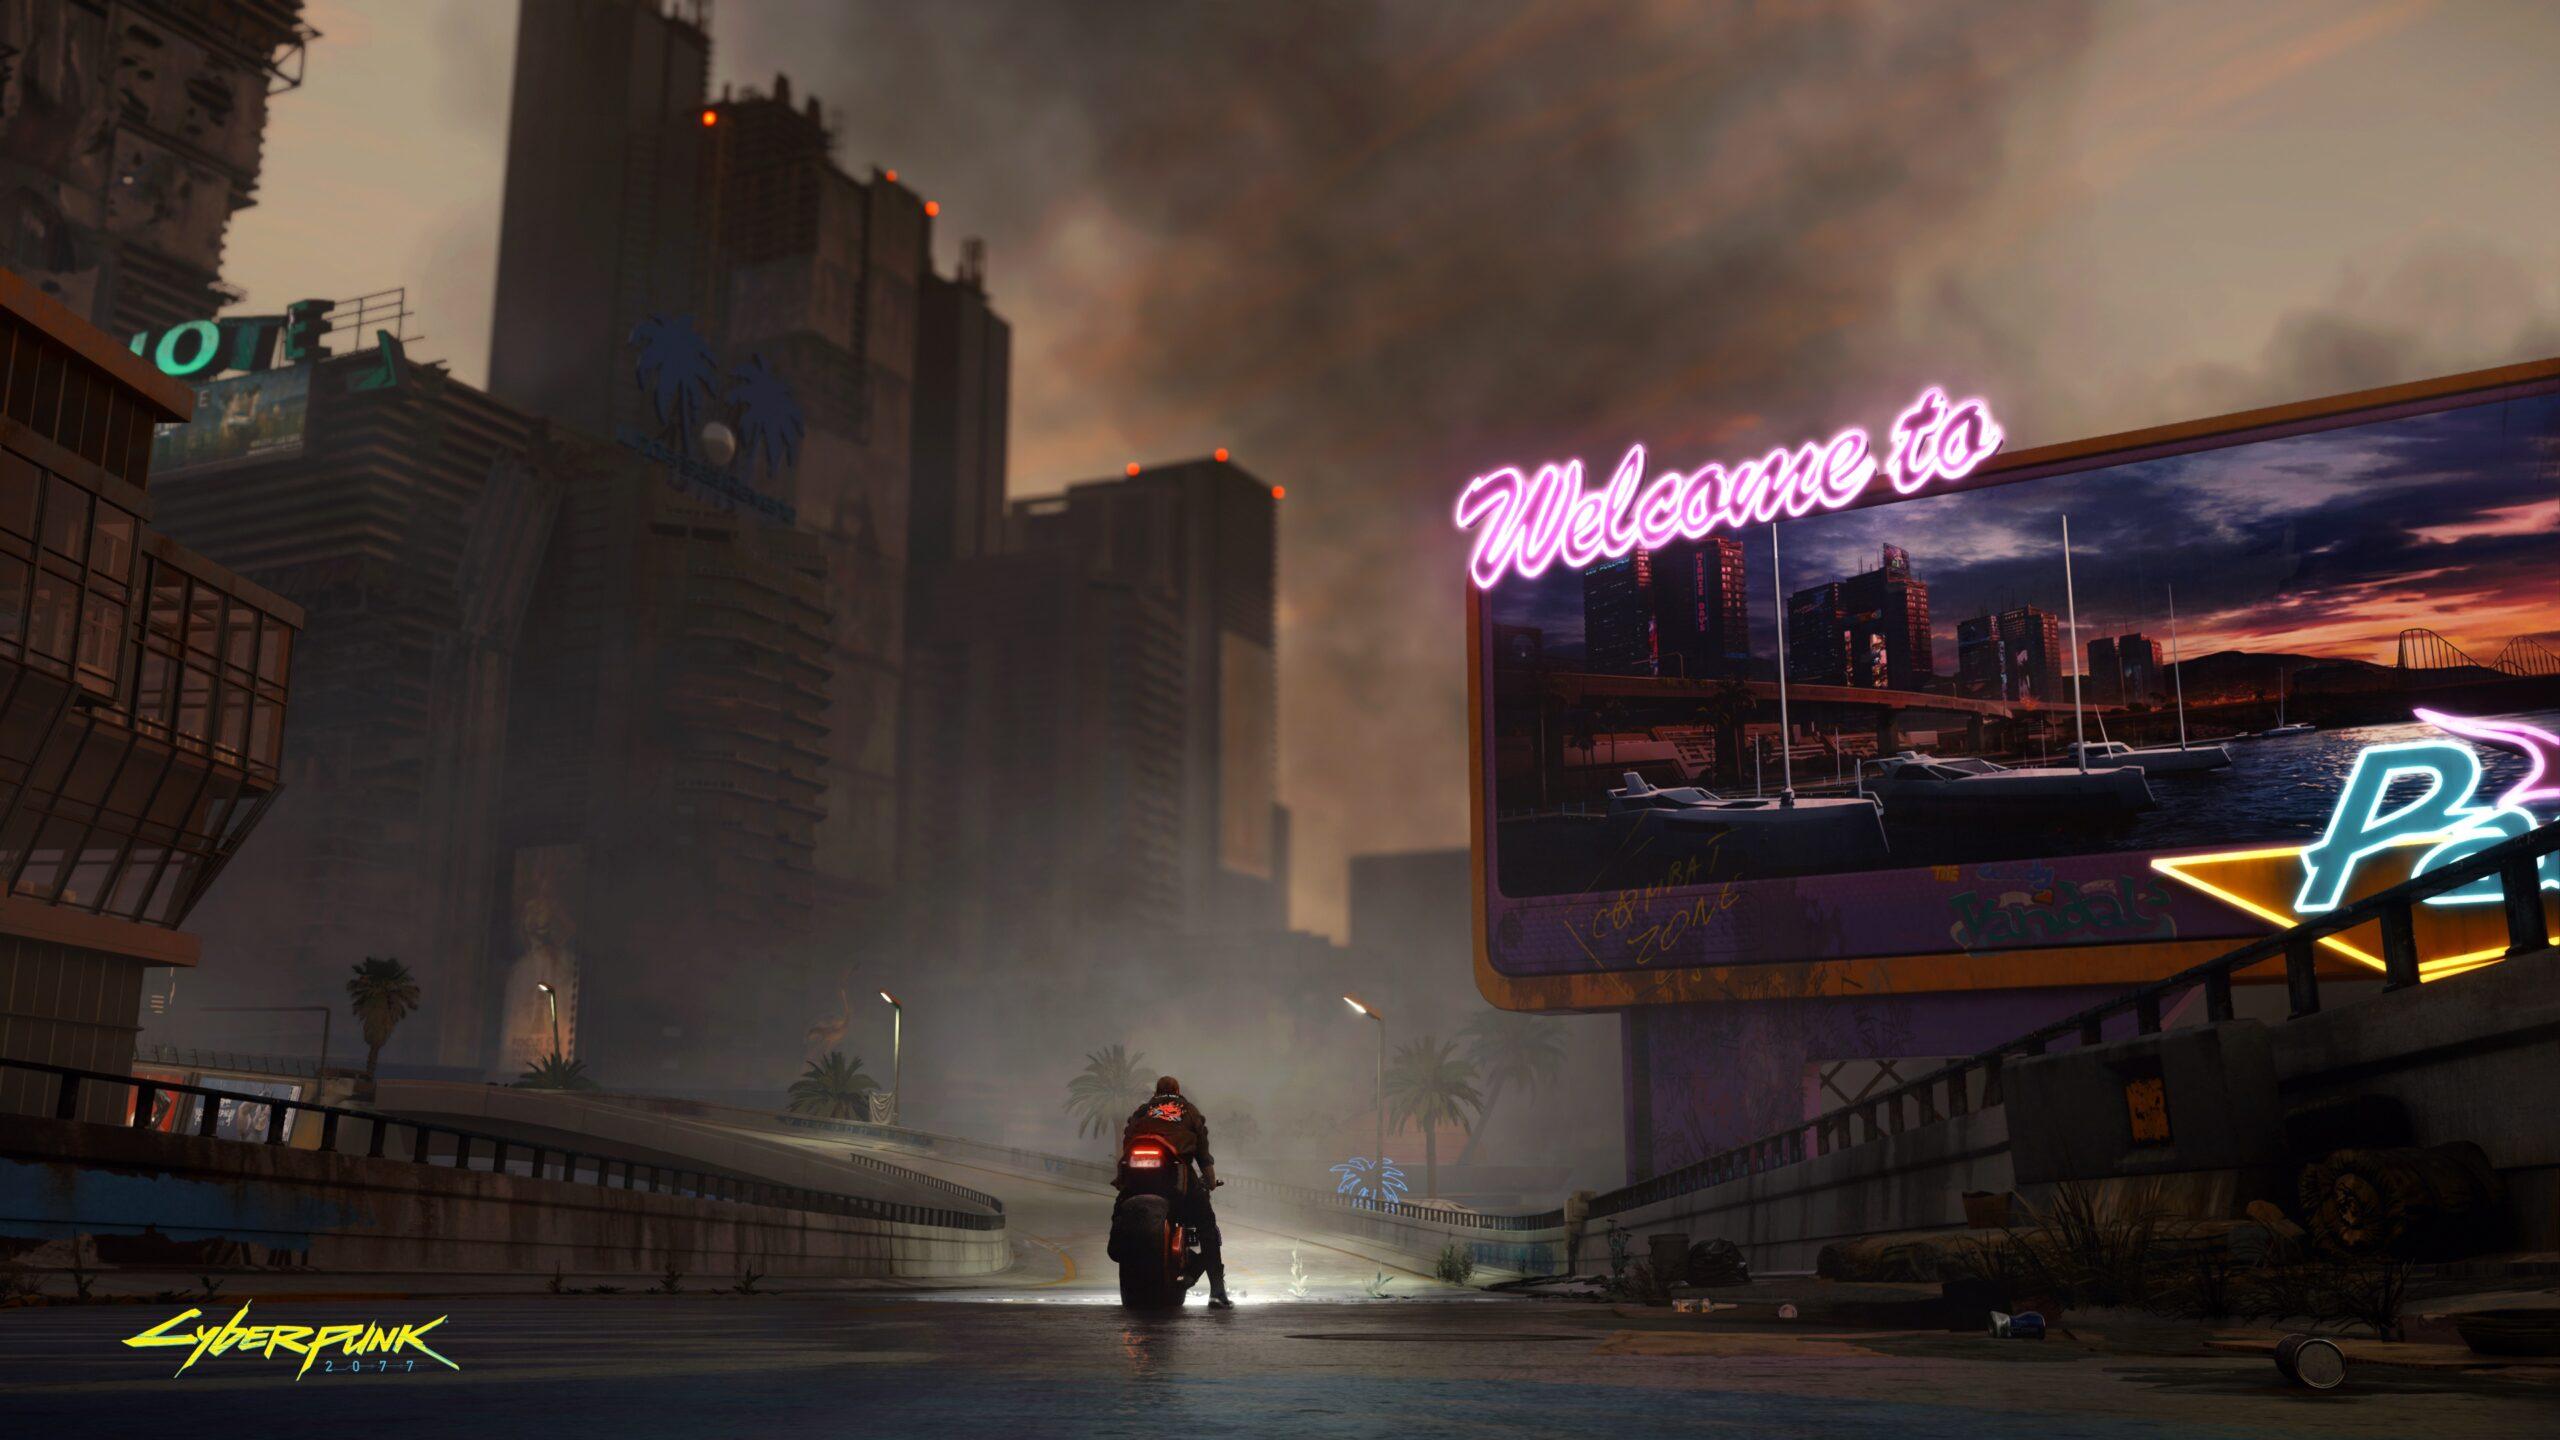 100 Wallpaper Cyberpunk 2077 Yang Bikin Pc Dan Smartphonemu Makin Canggih Gamebrott Com